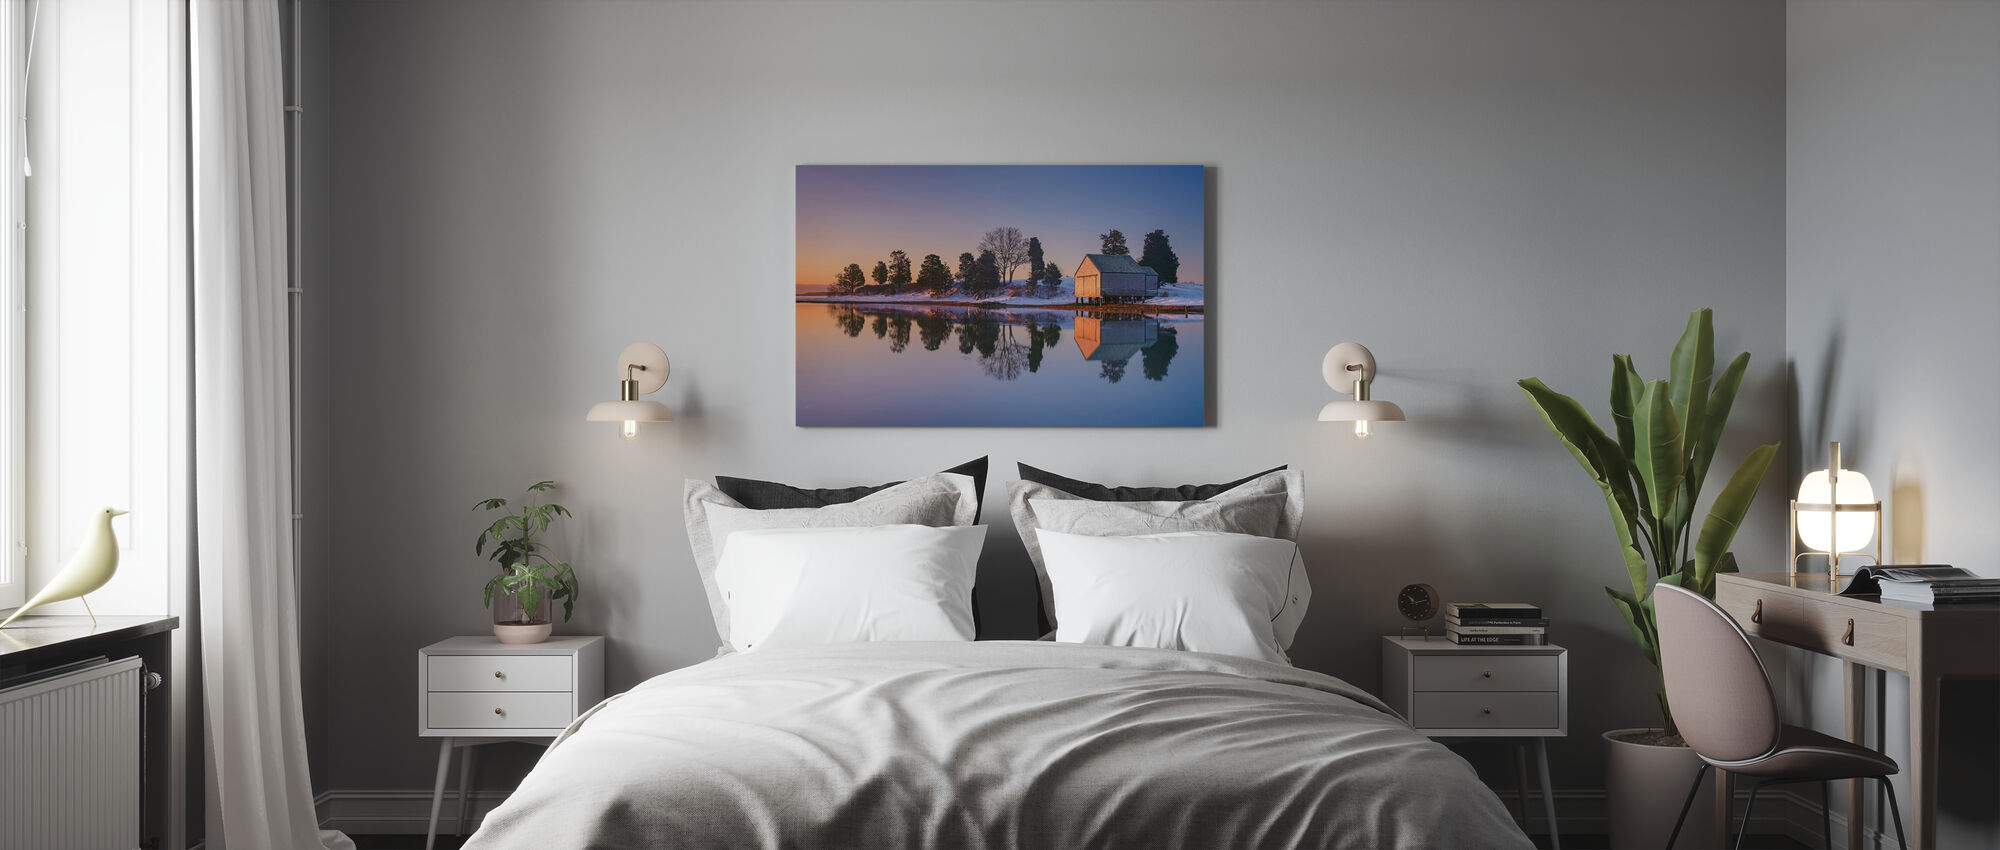 Winter Reflection - Canvas print - Bedroom